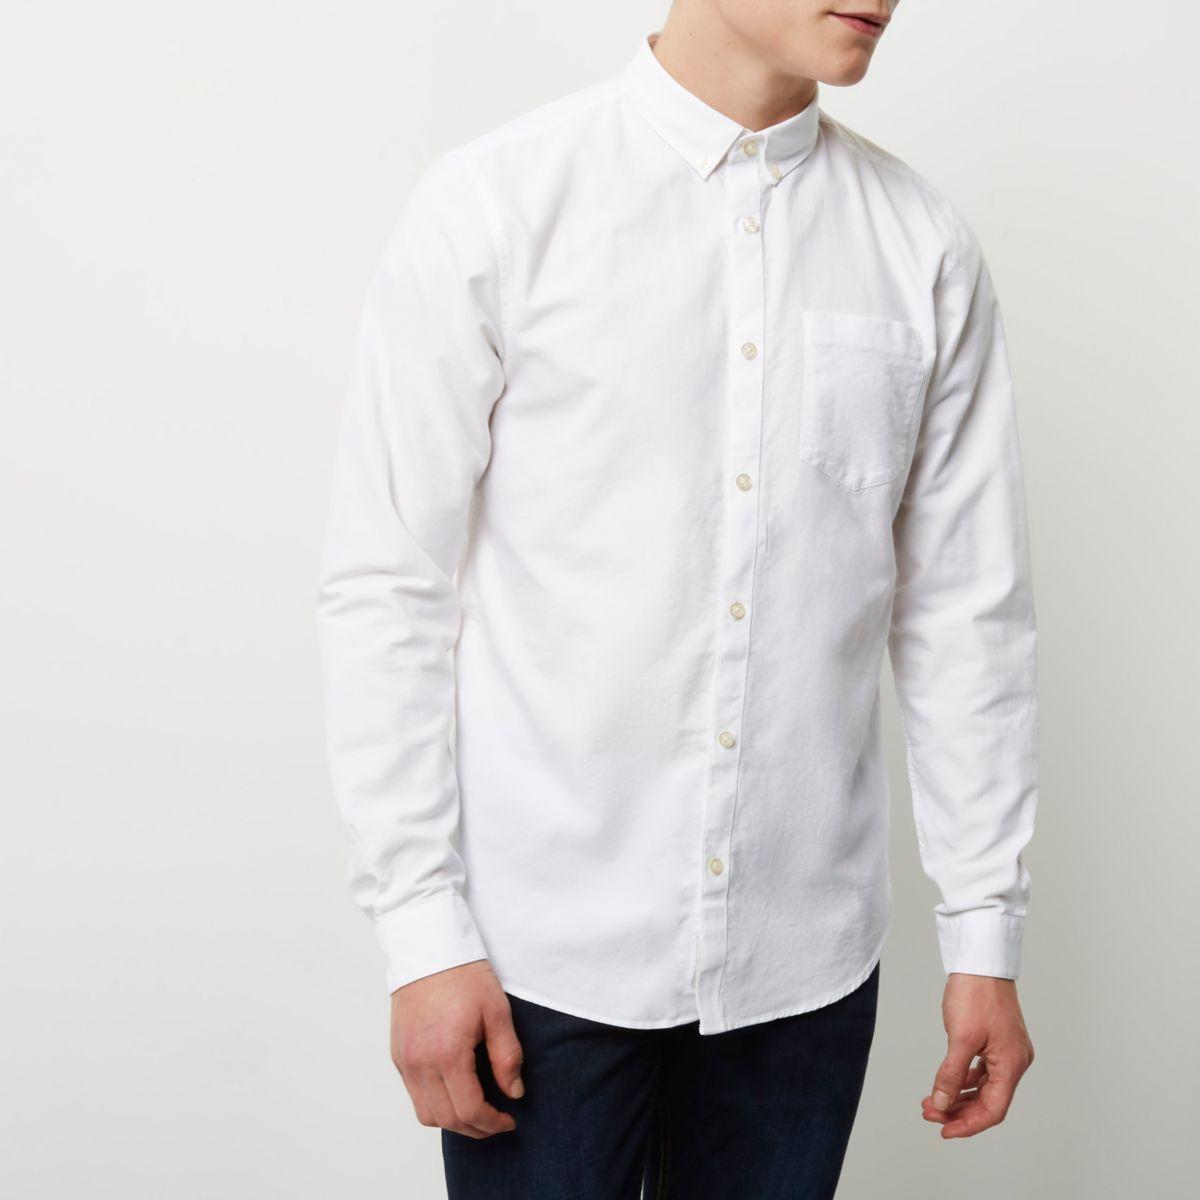 Weißes, casual, langärmliges Oxford Hemd